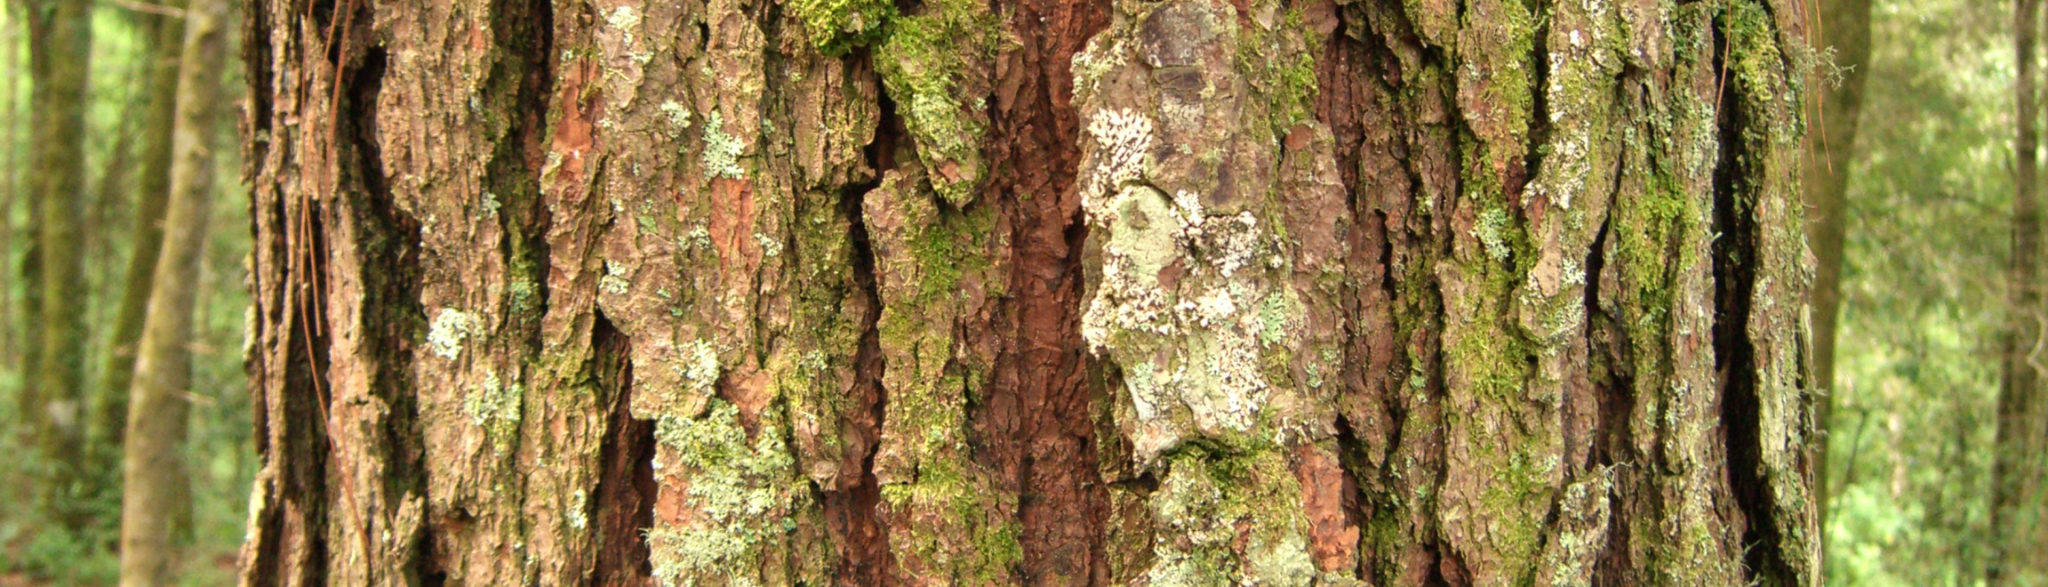 kora drzewa